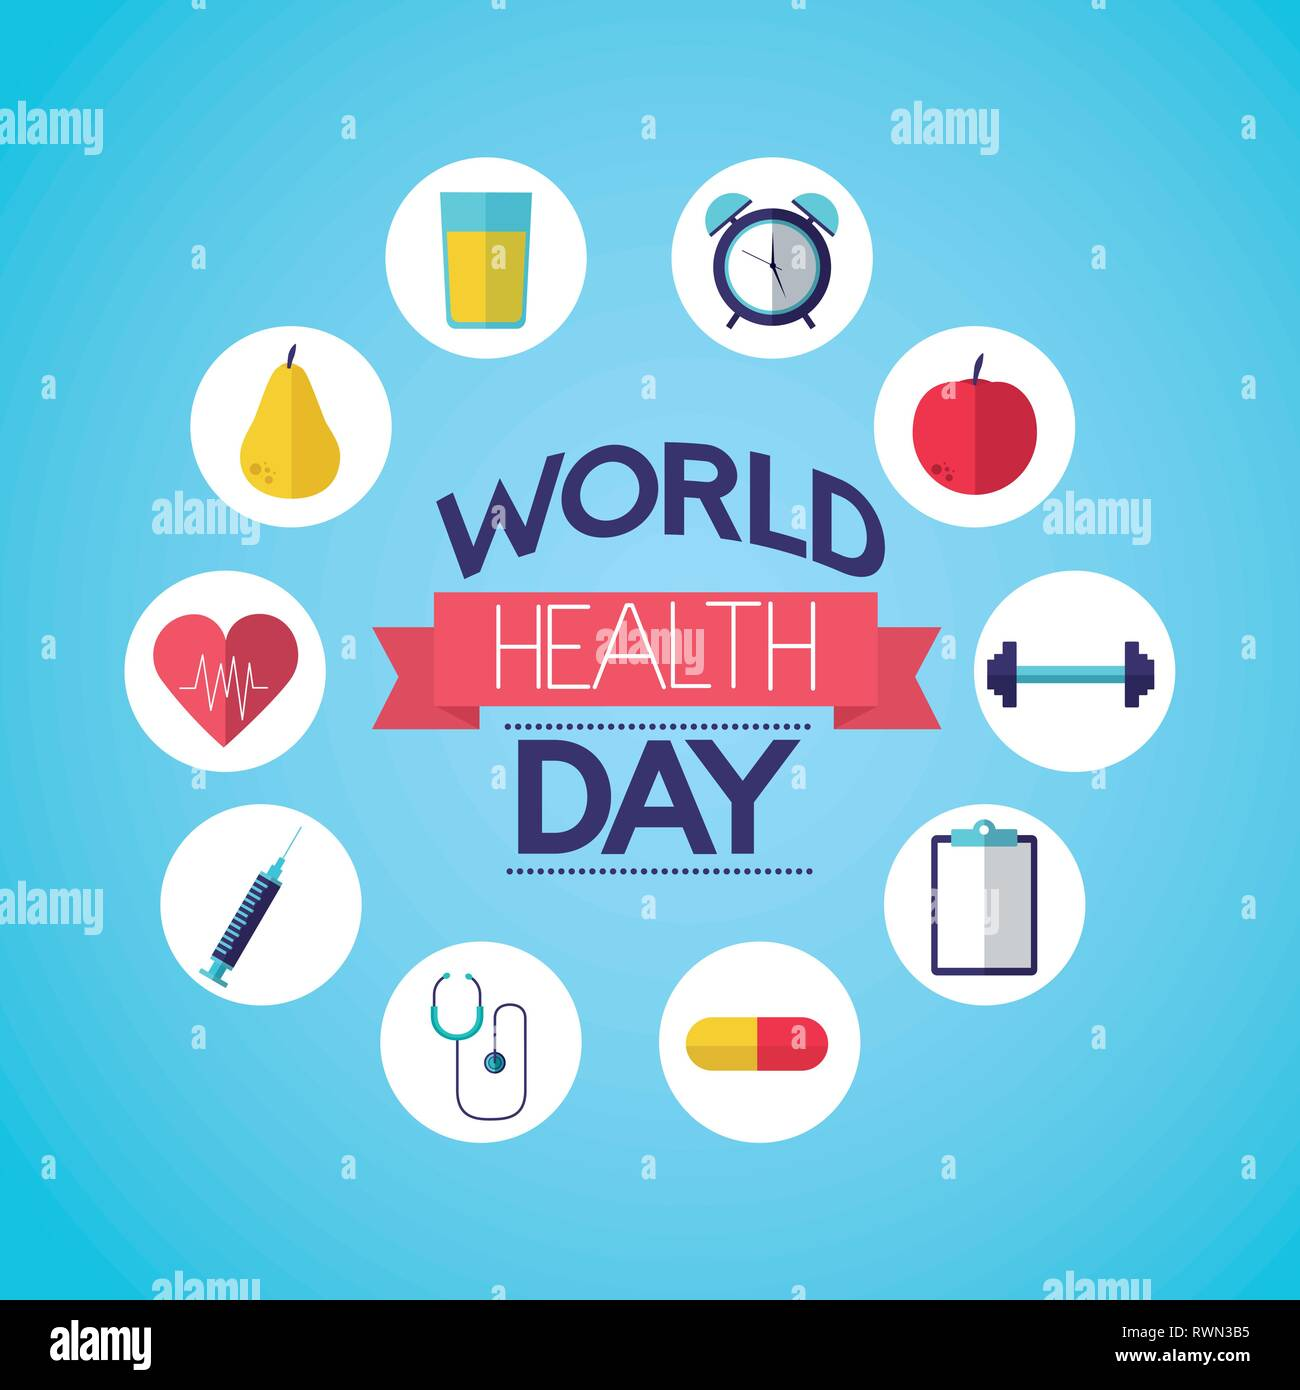 world health day - Stock Image